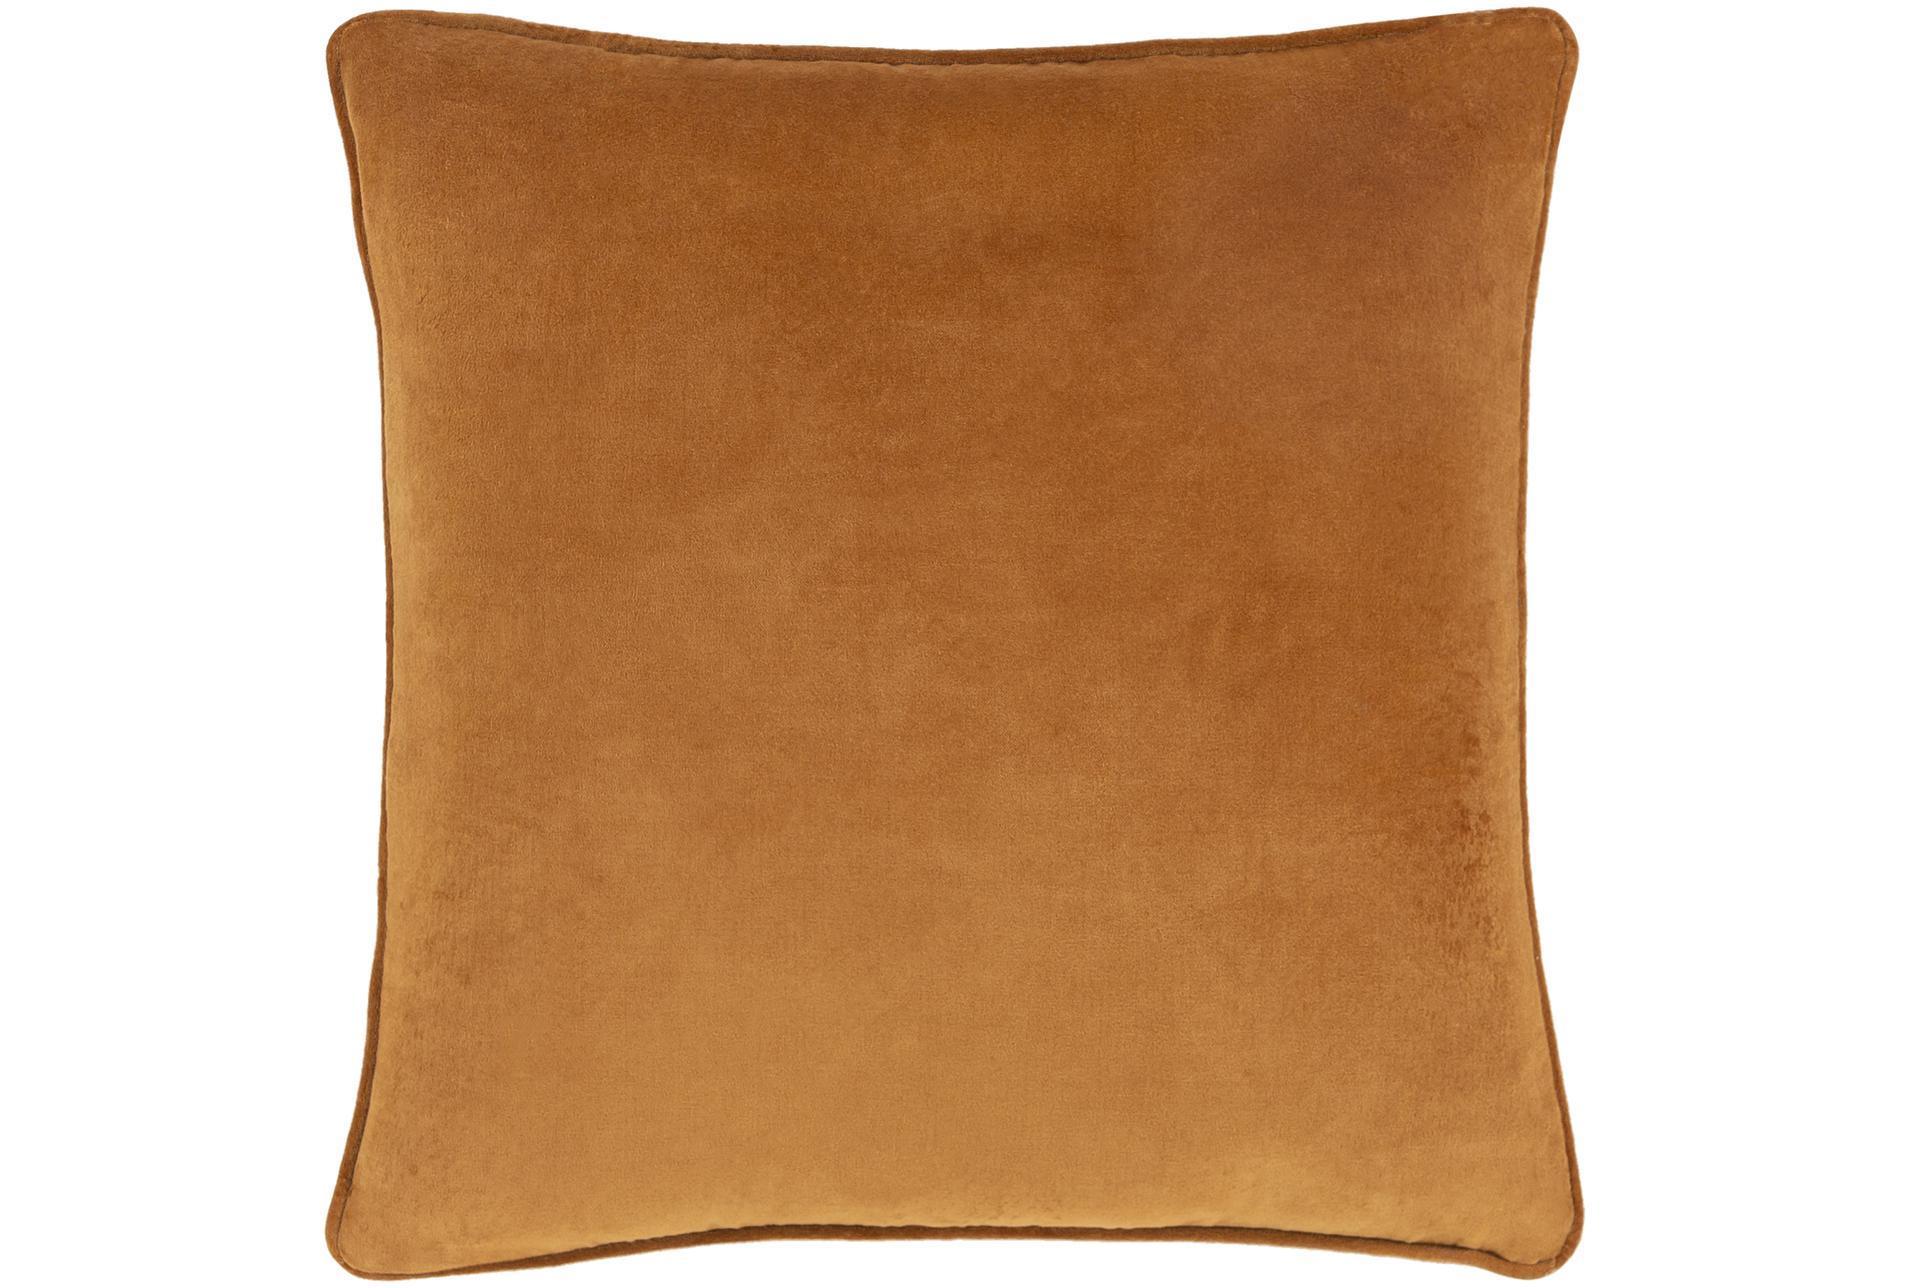 Accent Pillow Burnt Orange Velvet 20x20 Living Spaces